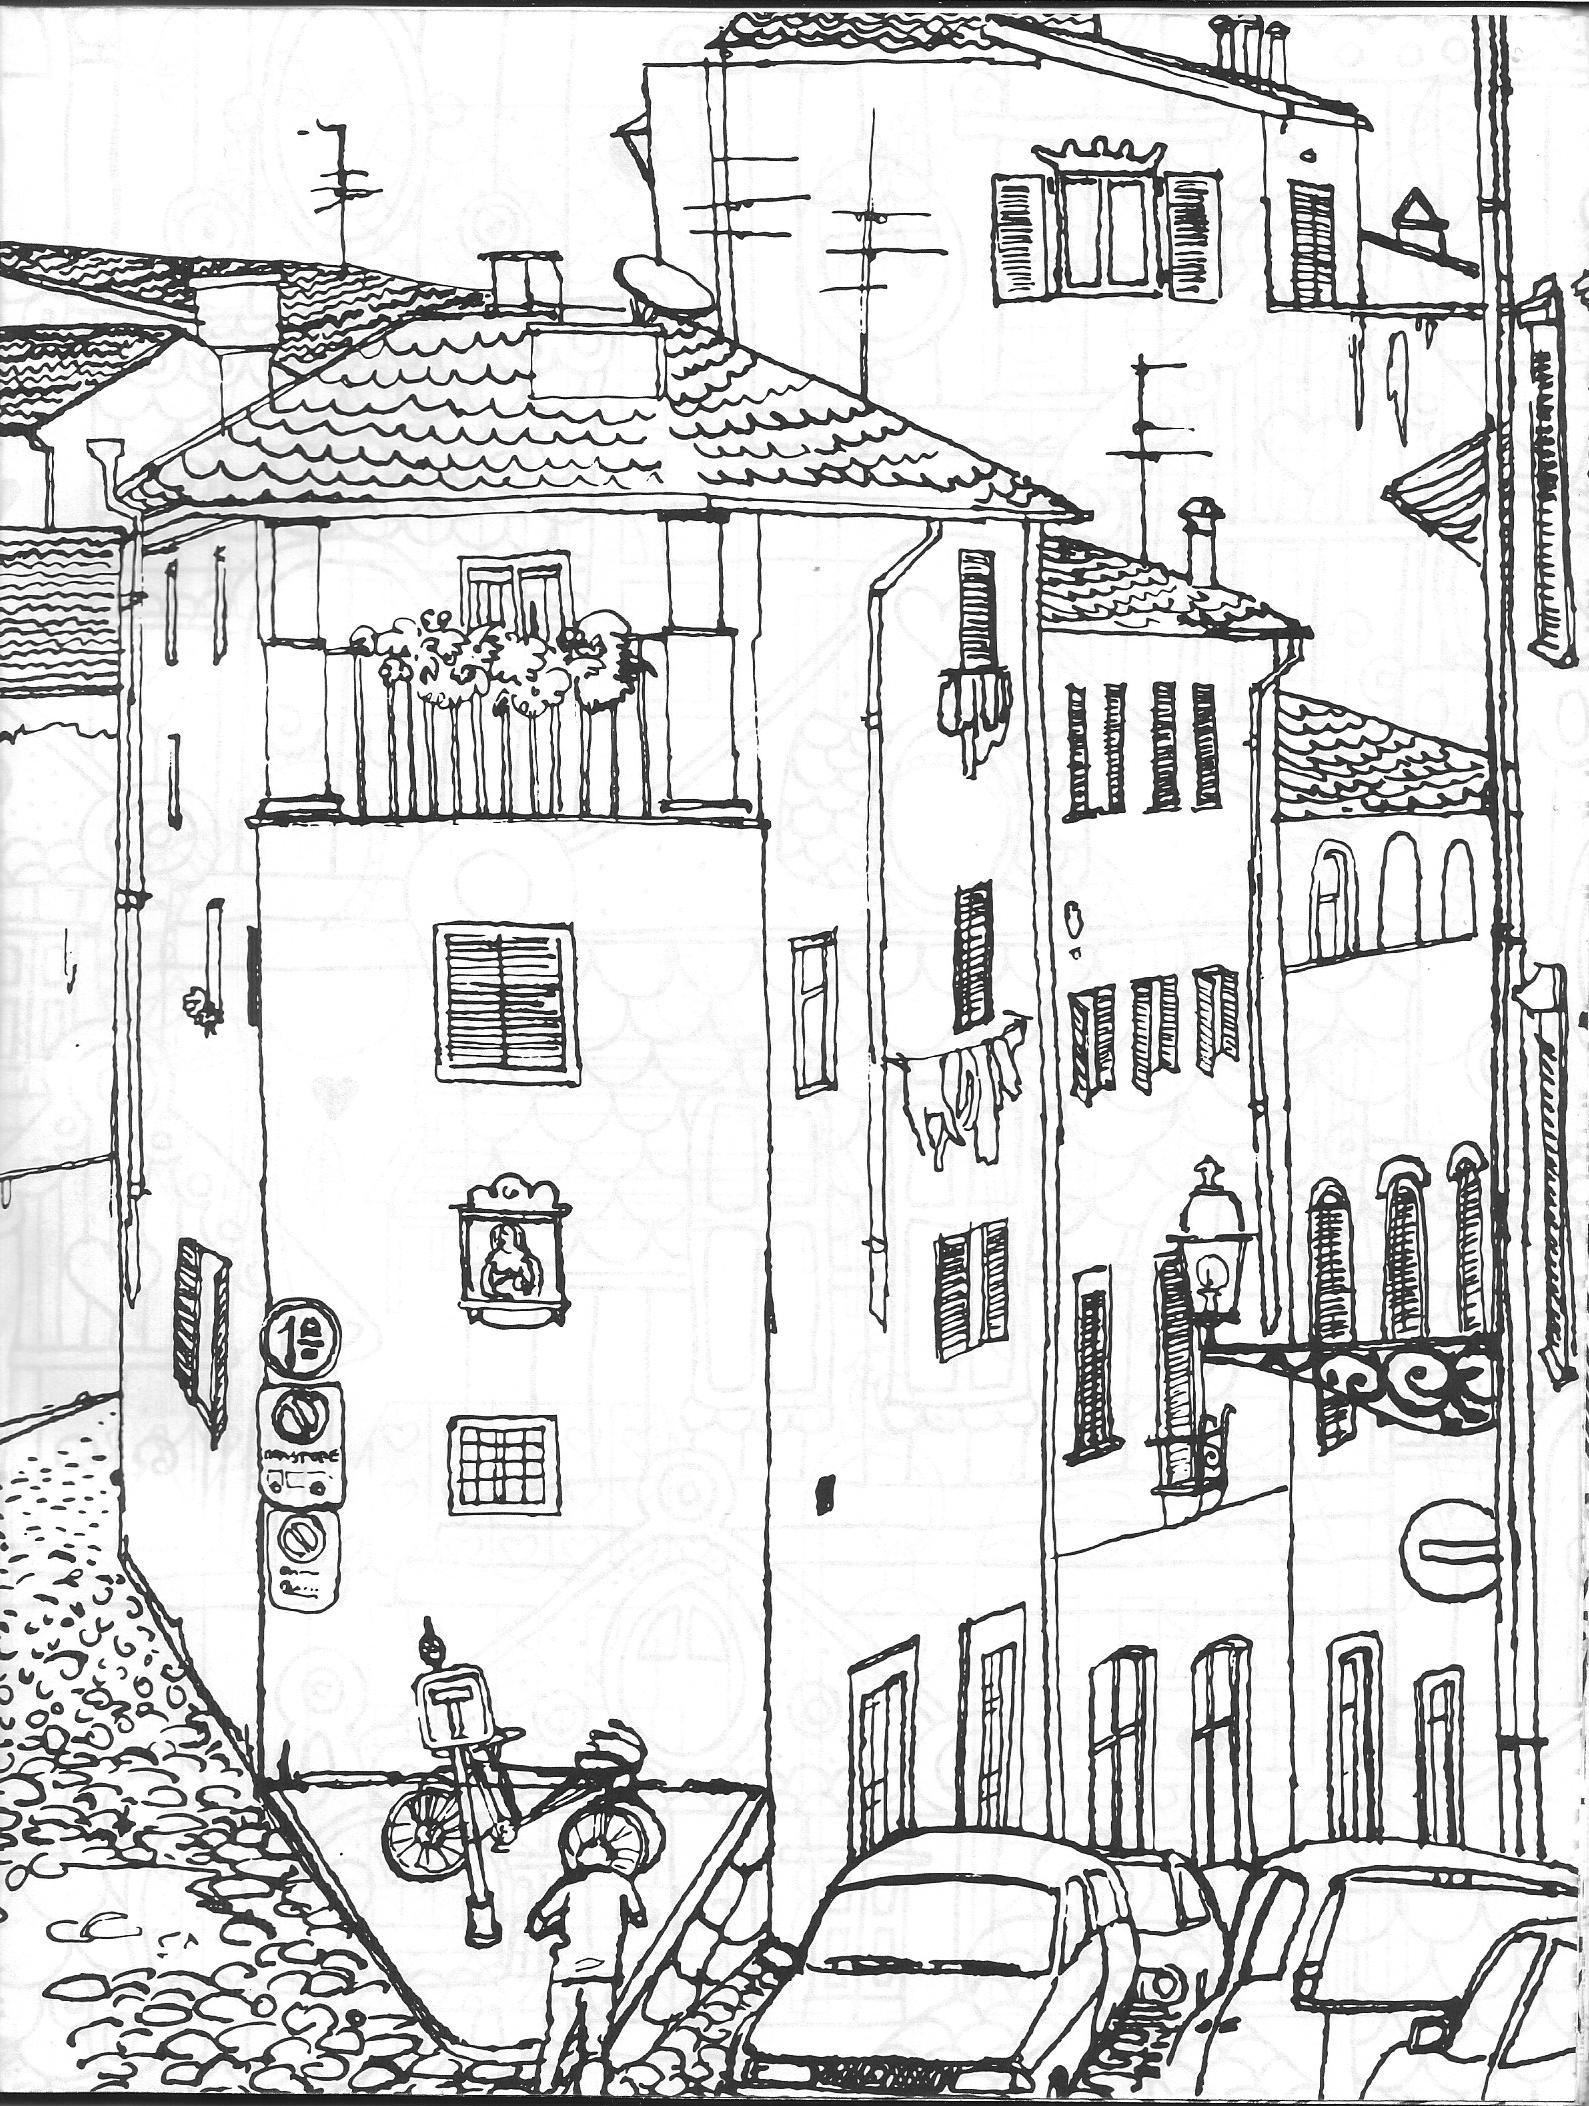 Vida Simples Cidade dos Sonhos | Ideas para pintar | Pinterest ...